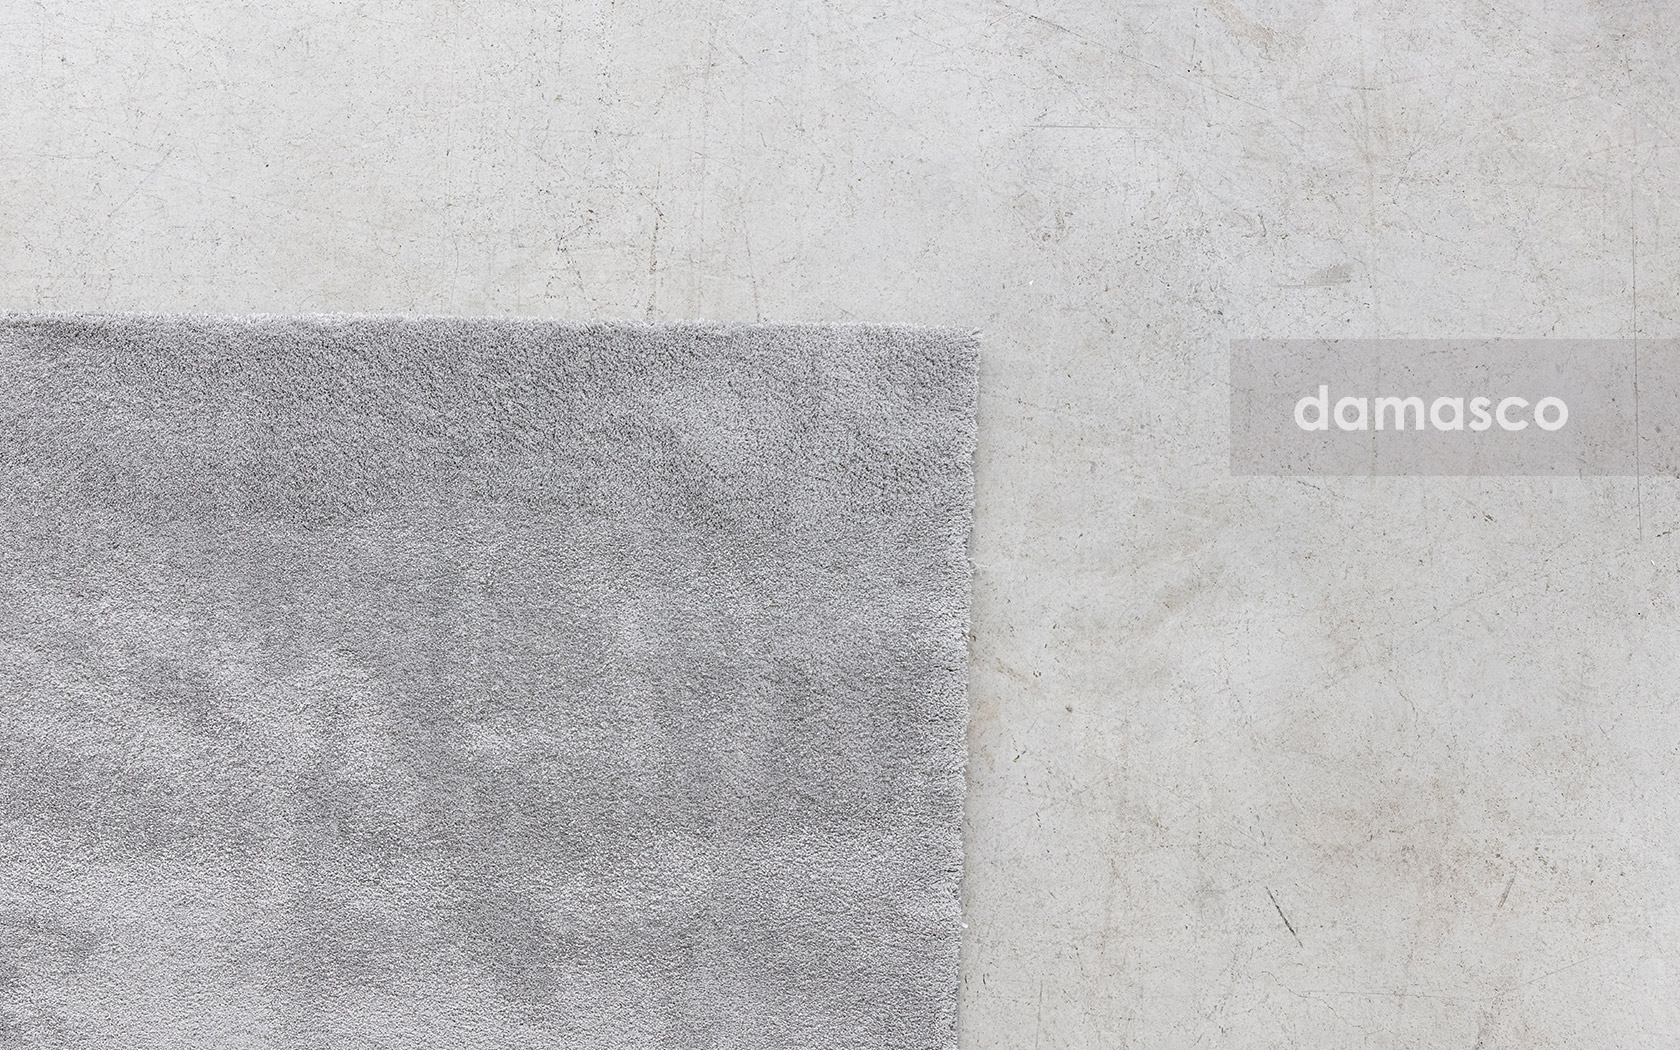 damasco-alfombra-2021-baja-01